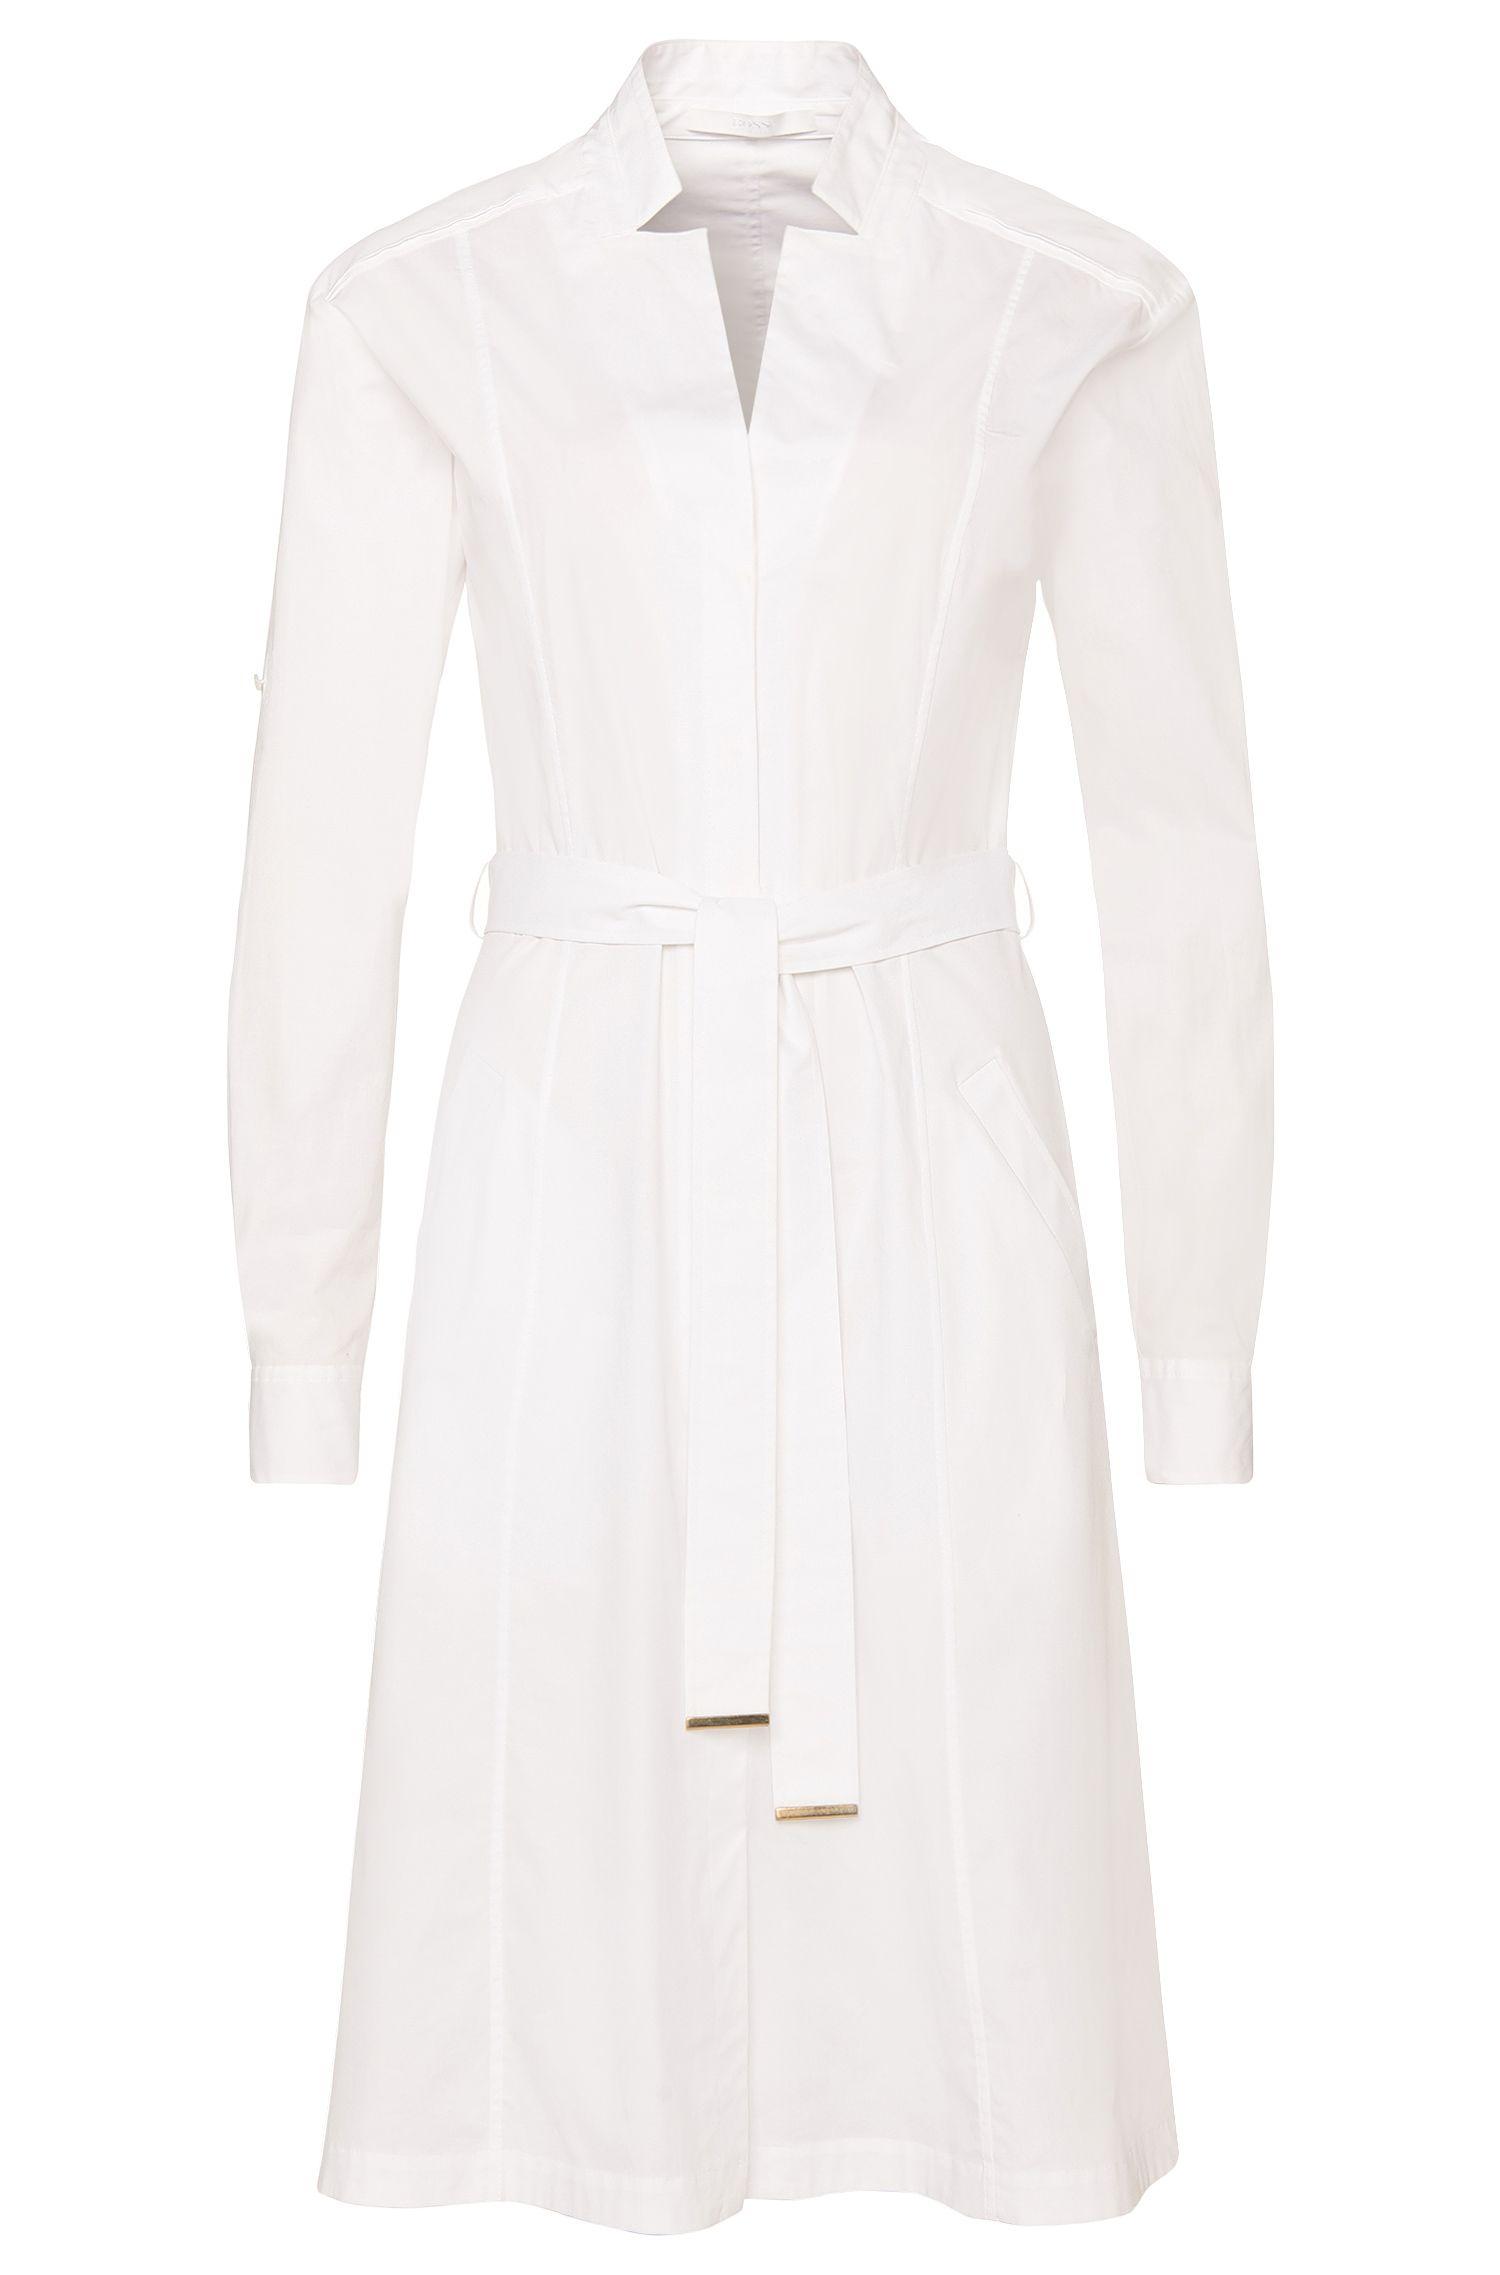 'Doctina' | Stretch Cotton Belted Shirt Dress